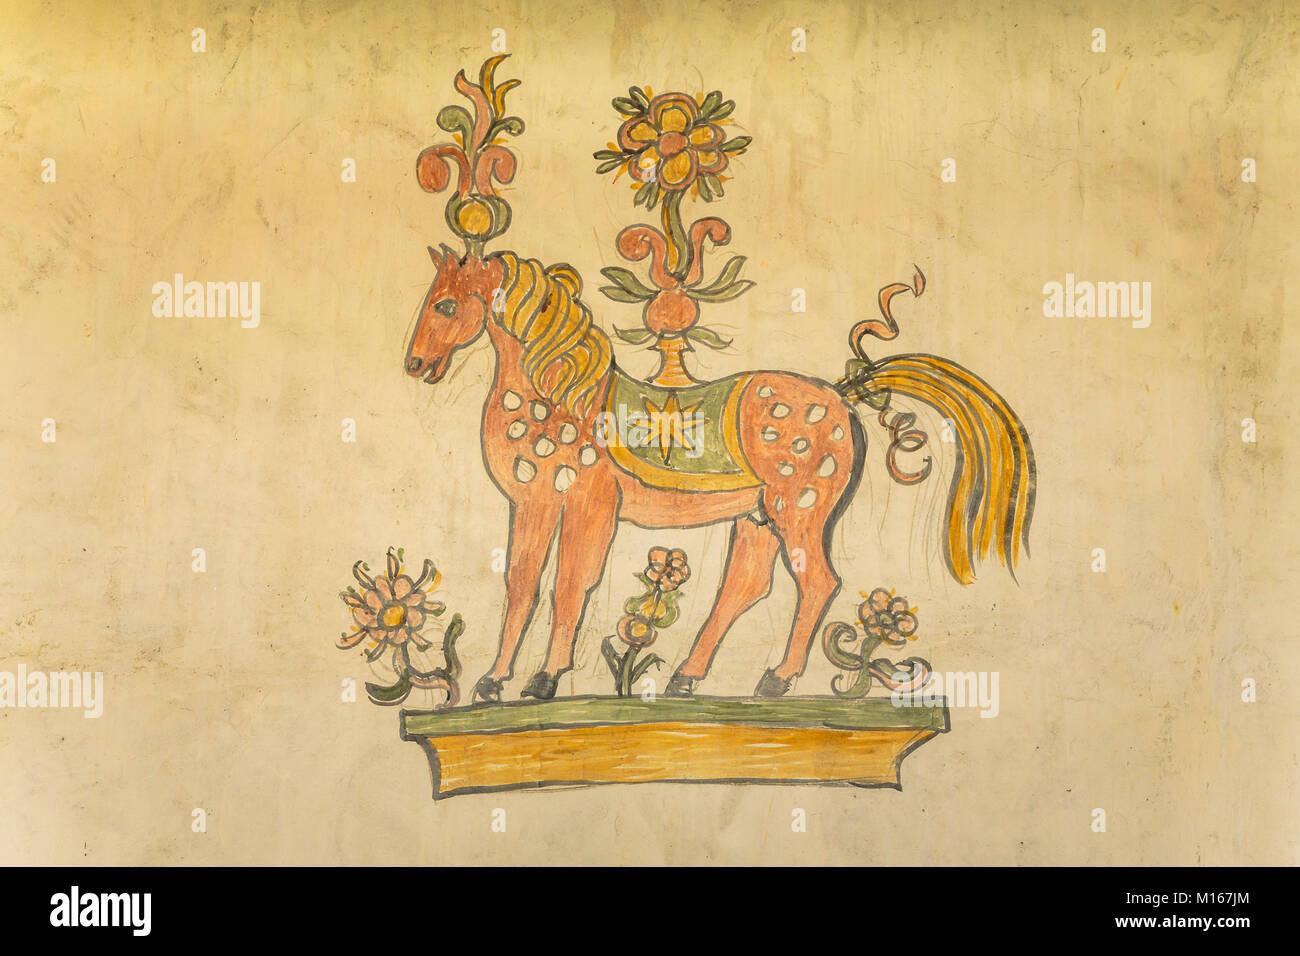 Mural Decor Stock Photos & Mural Decor Stock Images - Alamy